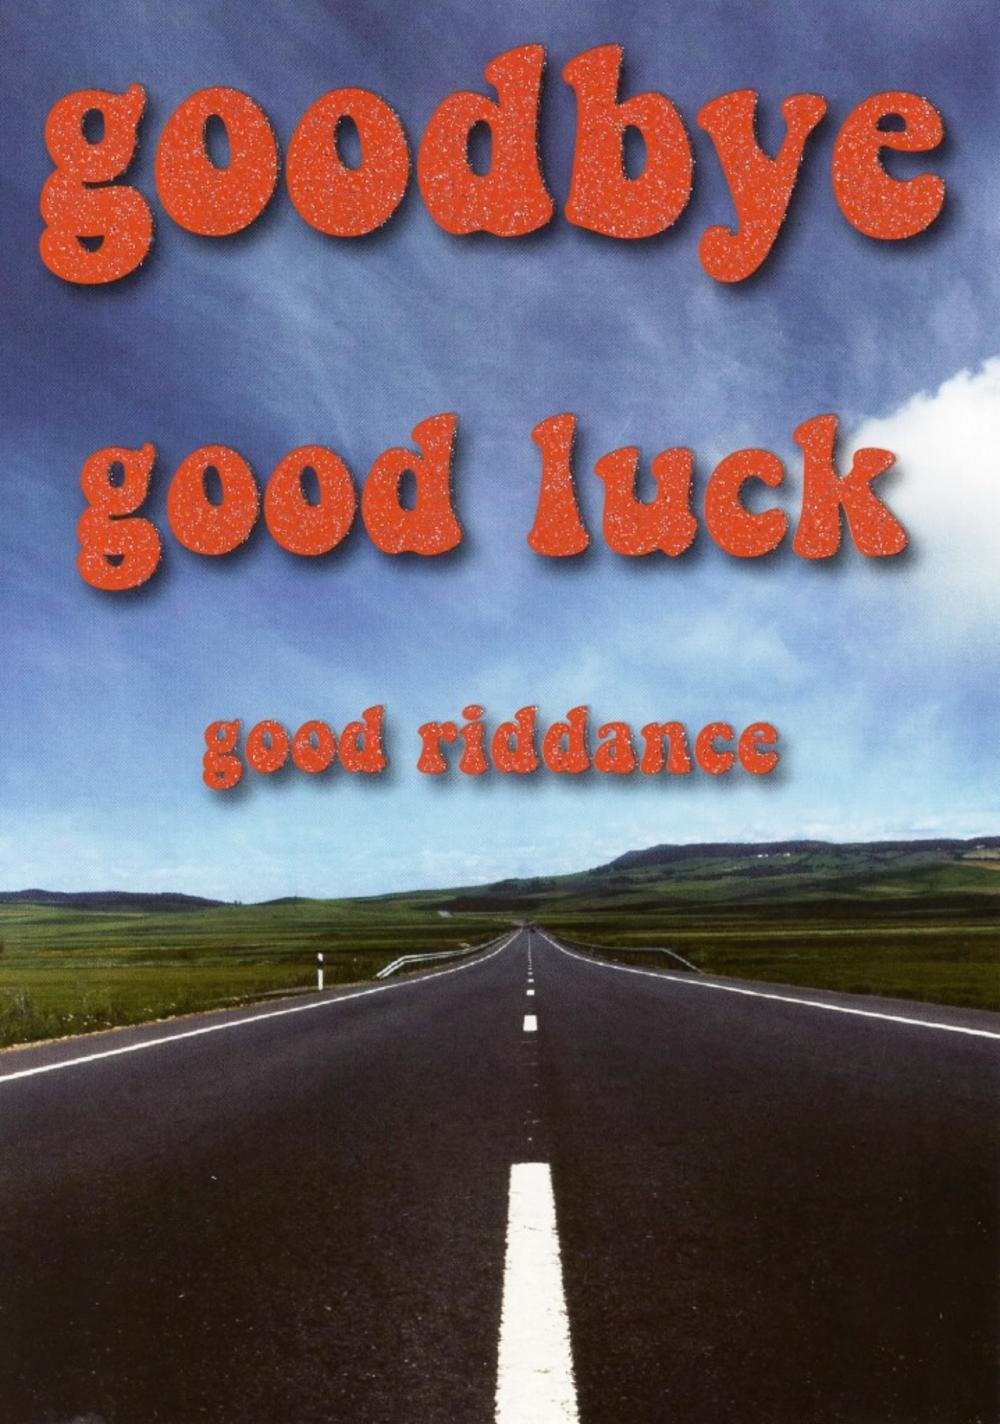 Goodbye Good Luck Good Riddance Funny Greeting Card